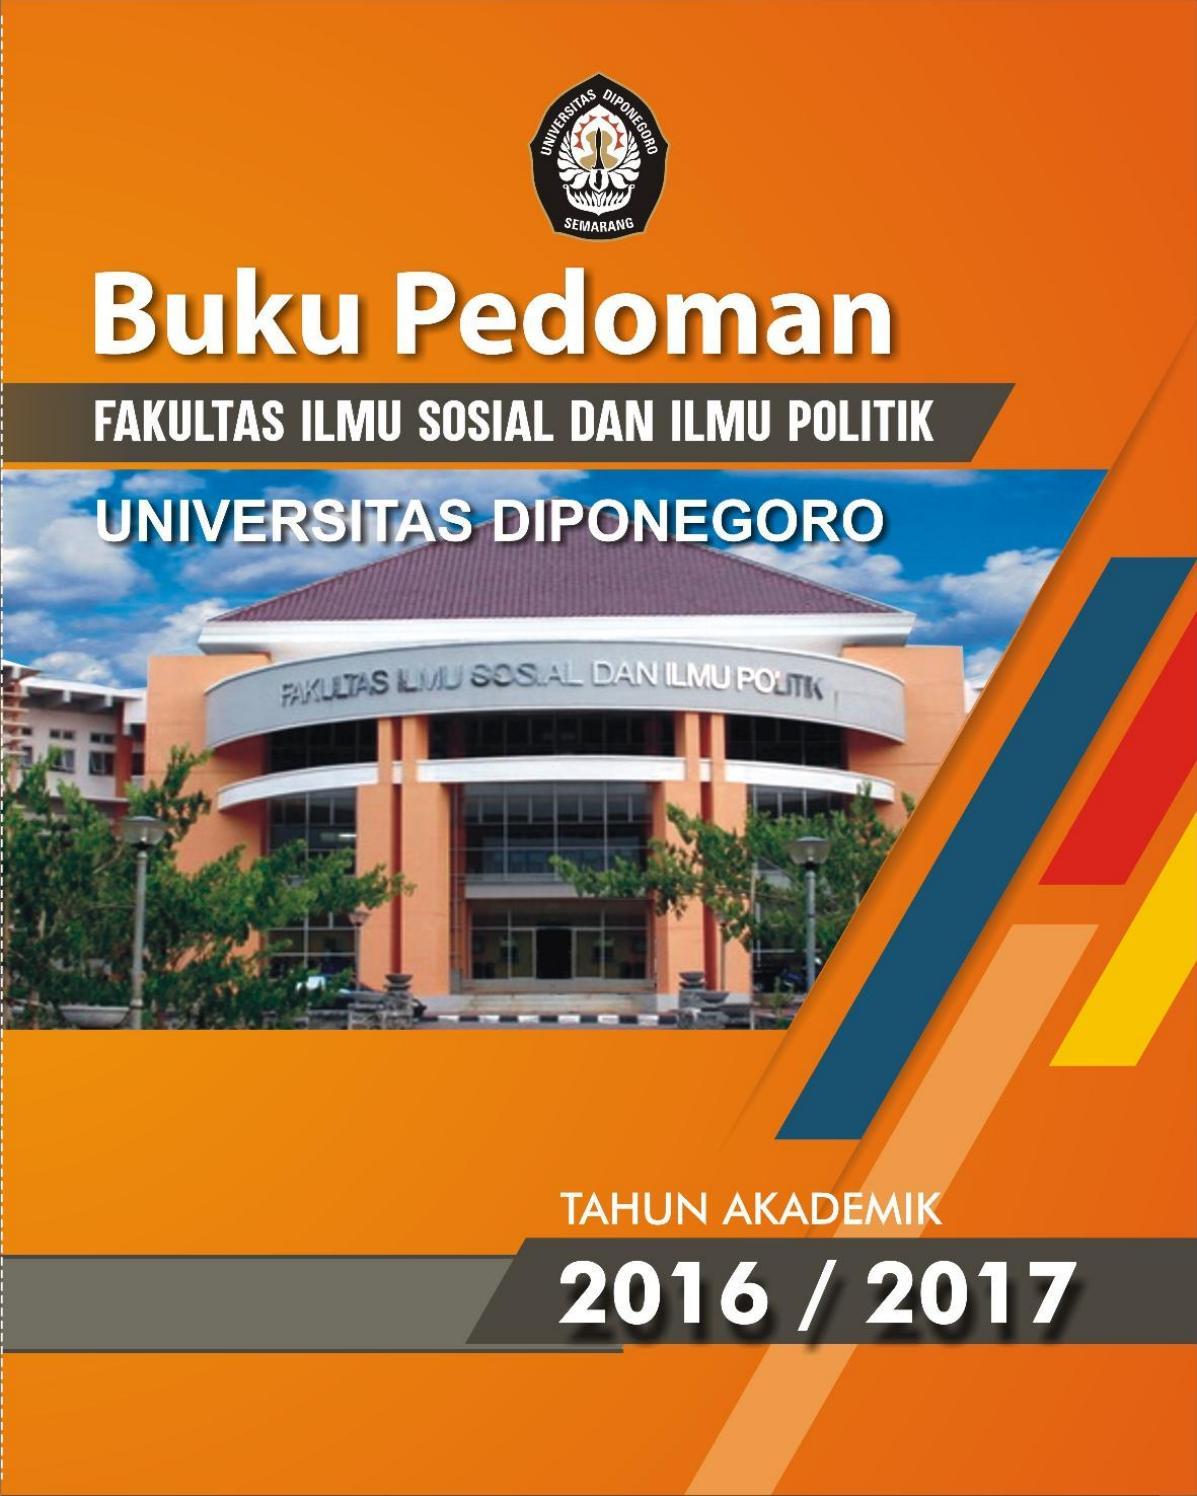 Buku Pedoman Fisip Undip By Orange Diponegoro Issuu